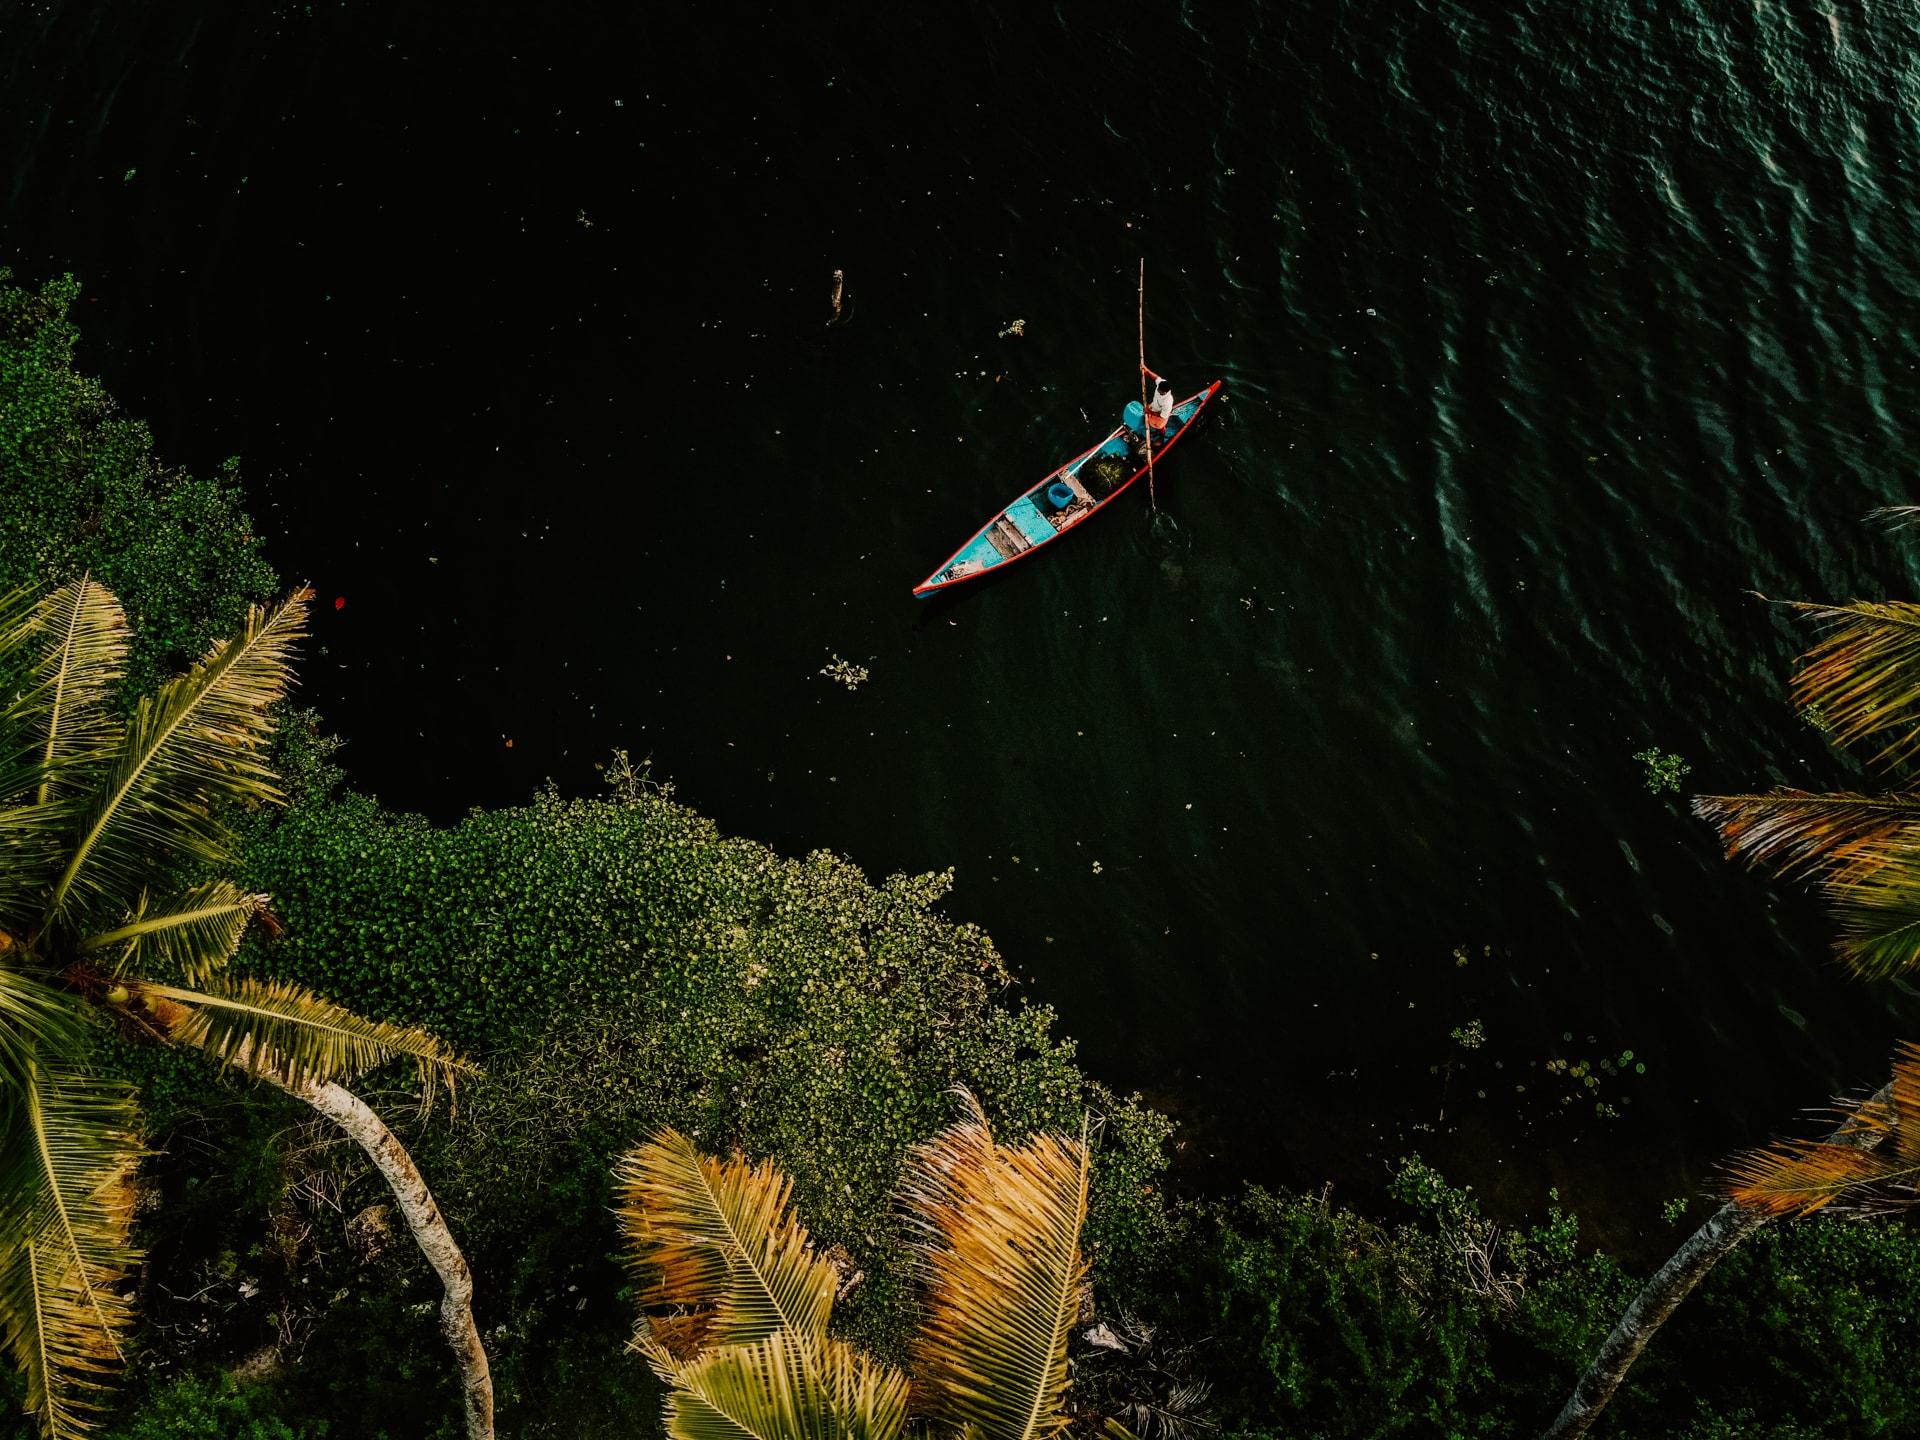 kerala india river boat